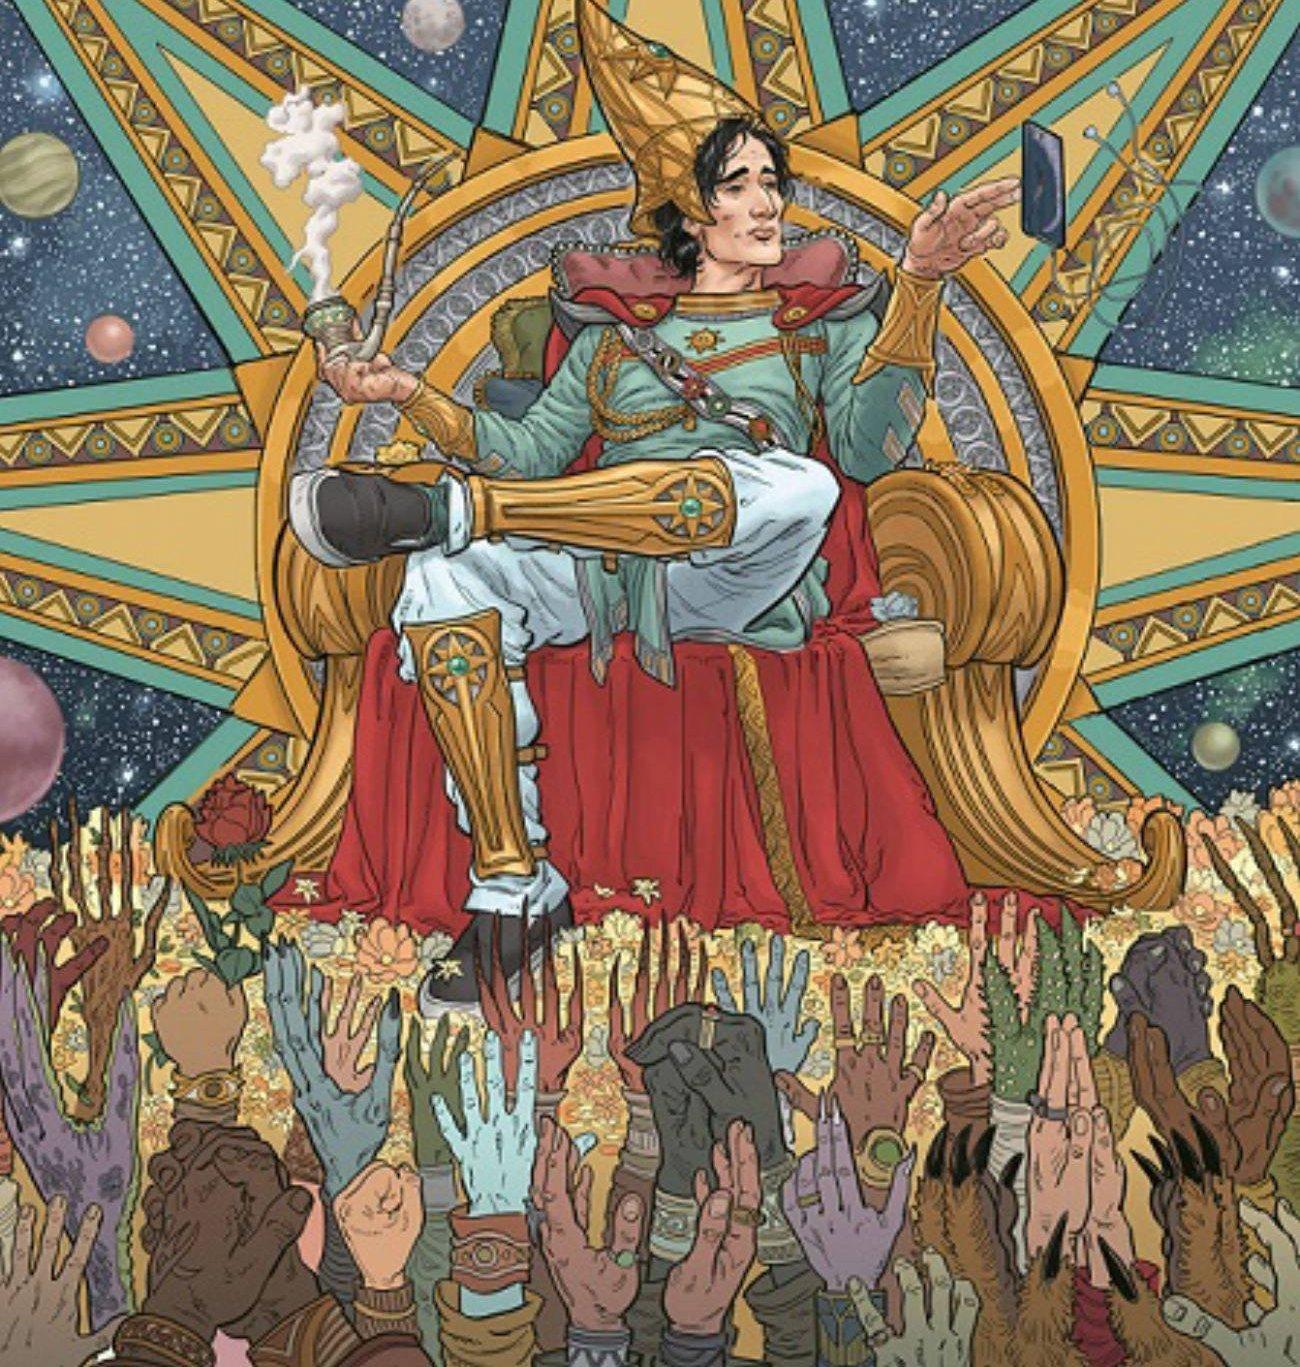 I Maestri, la folle e visionaria avventura fantasy splatter di Steve Skroce